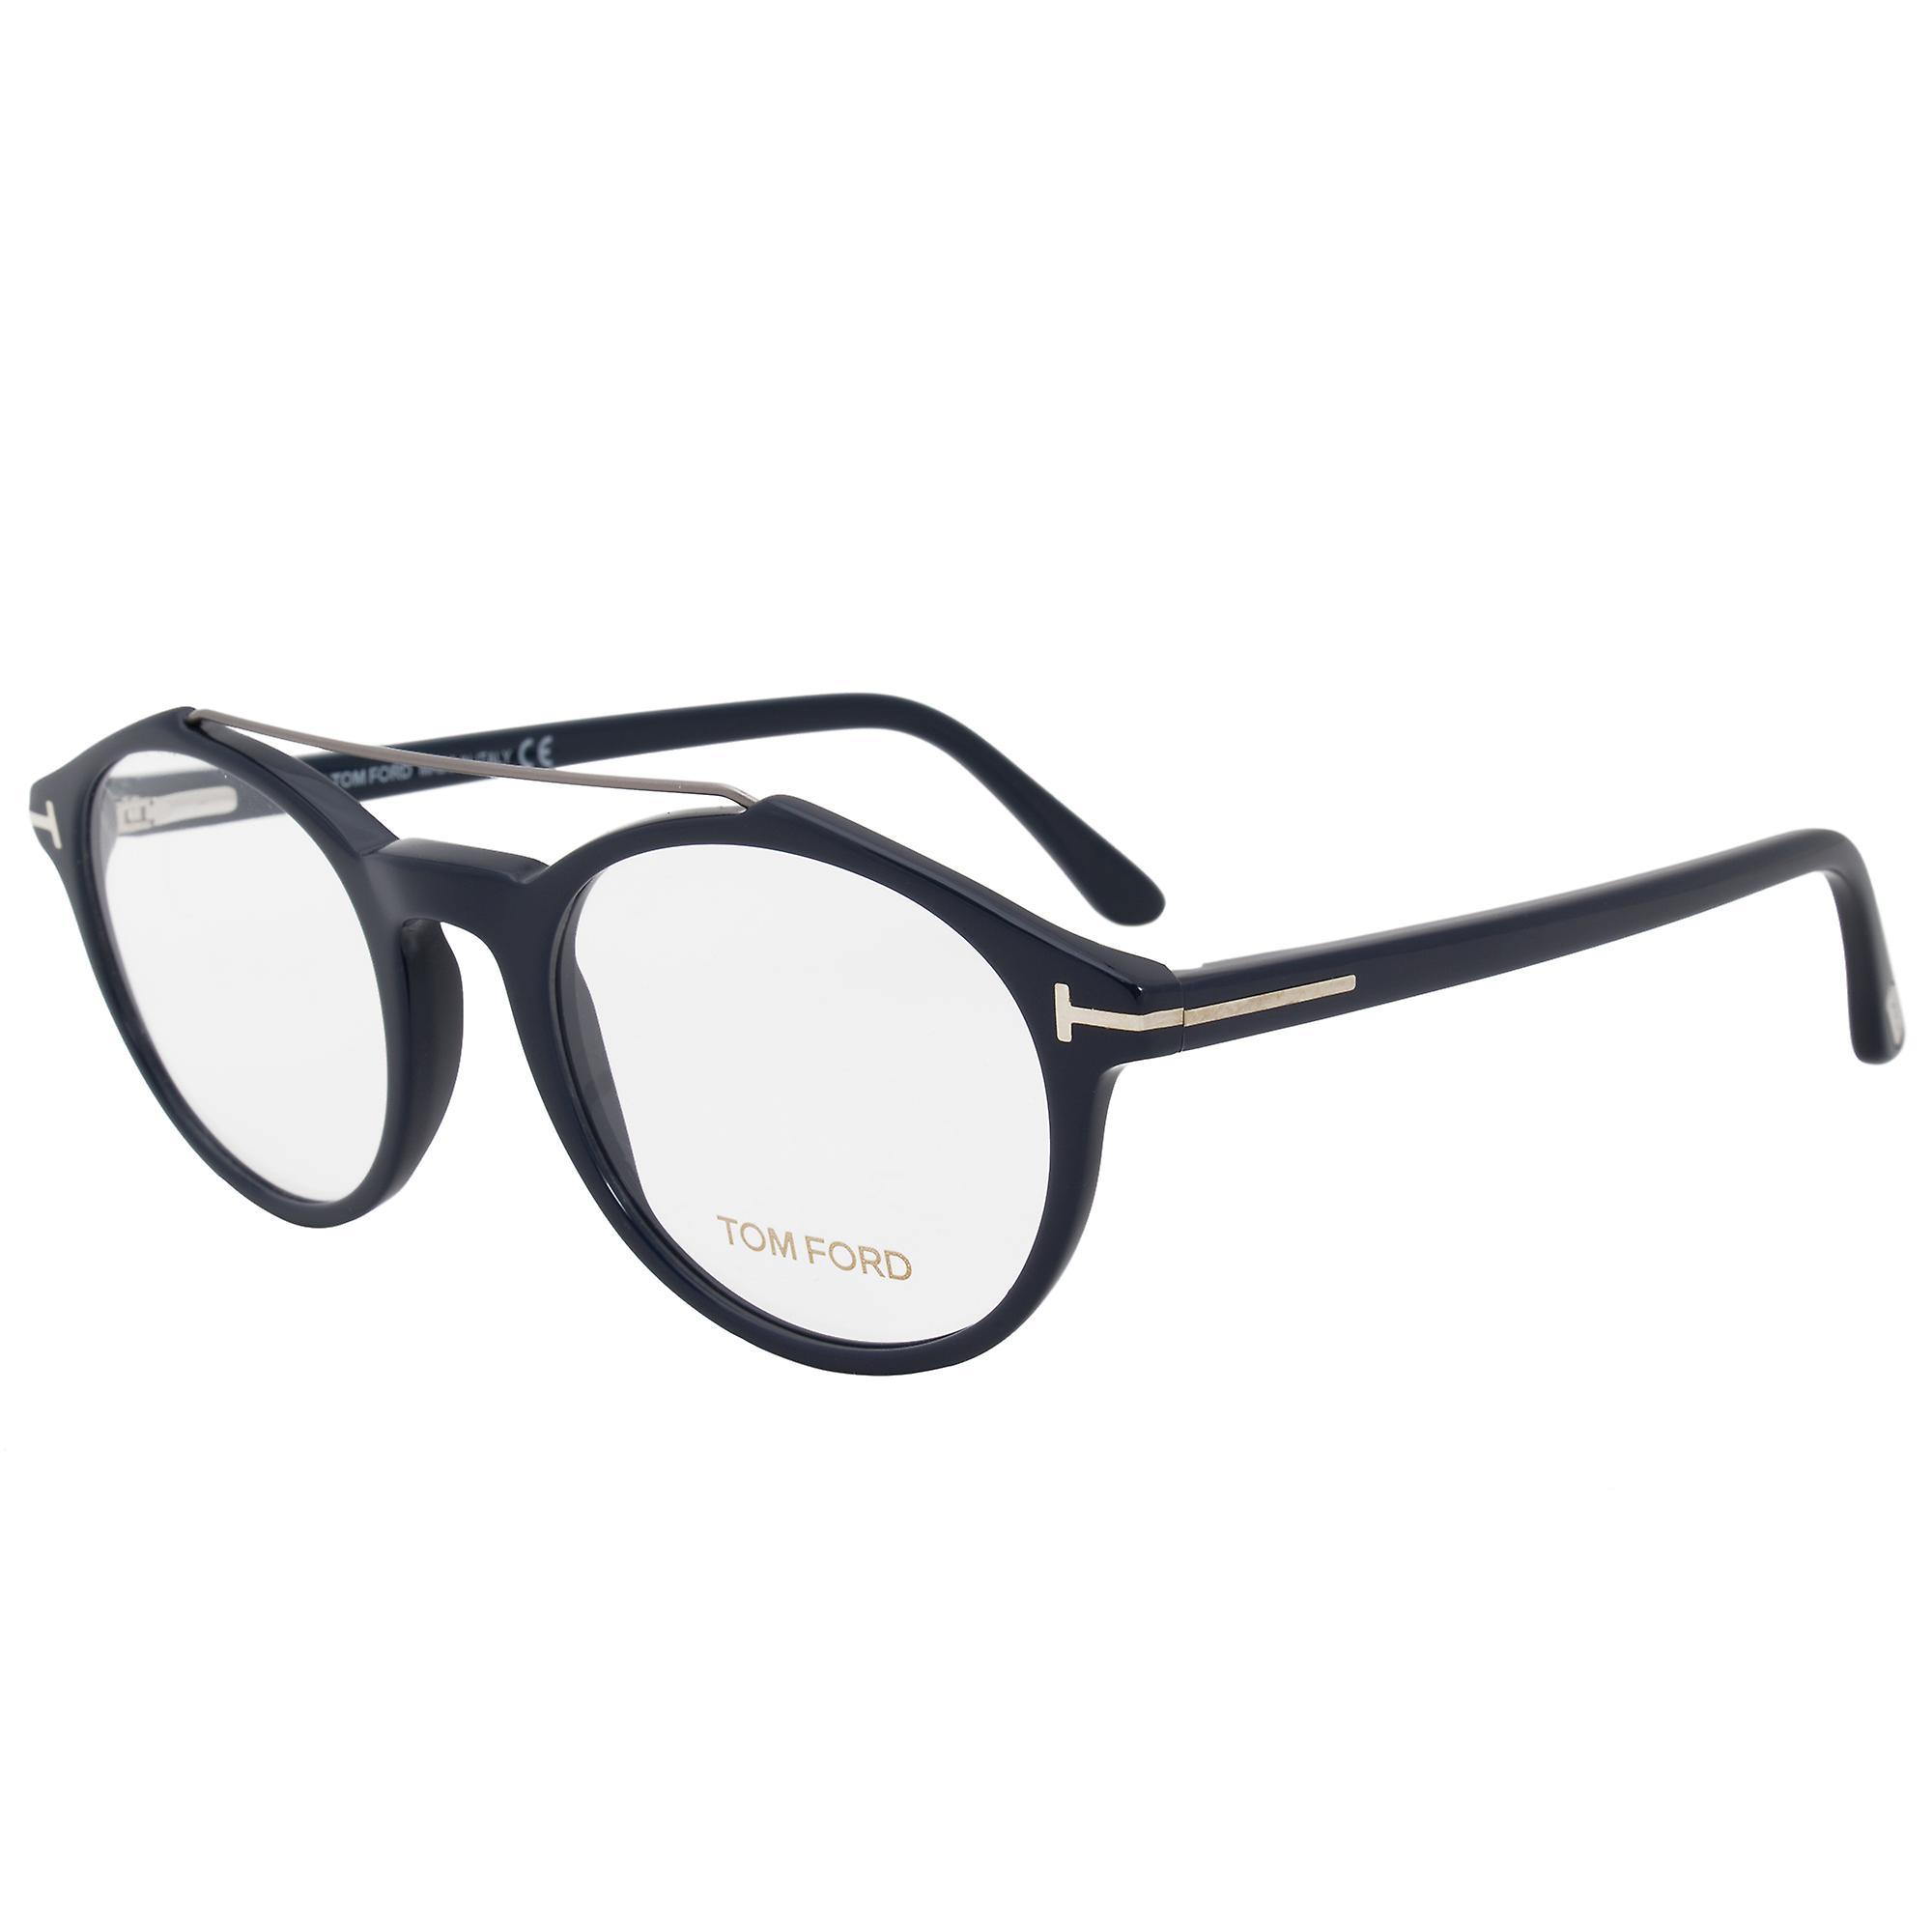 Tom Ford FT5455 90 Round | Blue| Eyeglass Frames